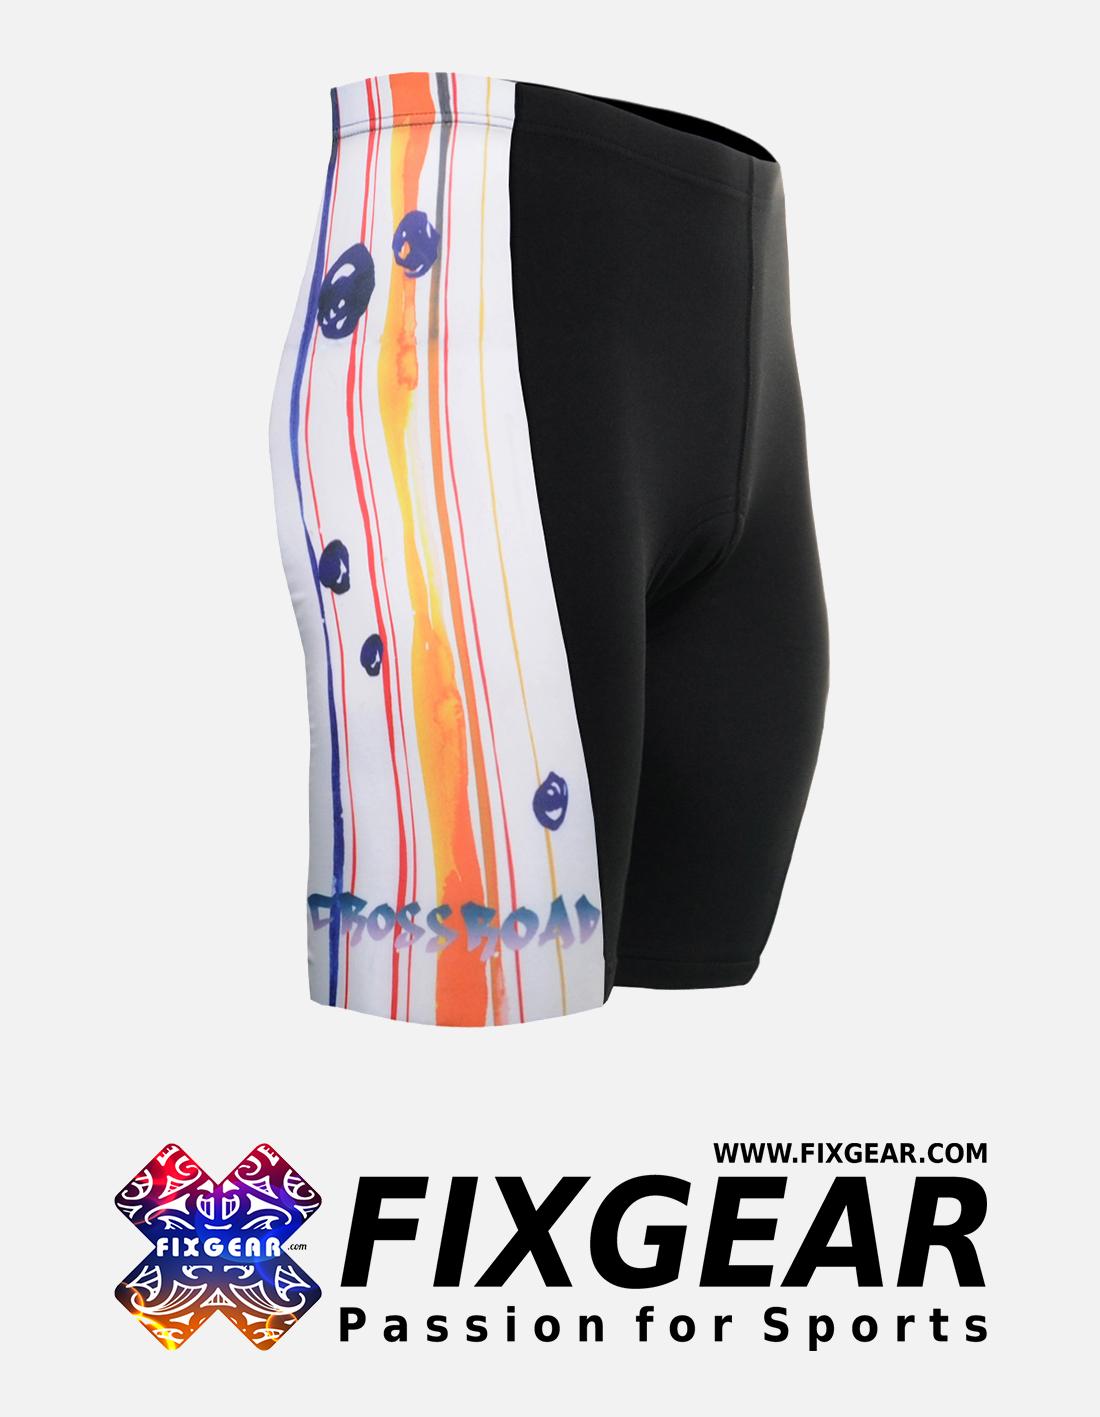 FIXGEAR ST-W20 Women's Cycling Padded Shorts